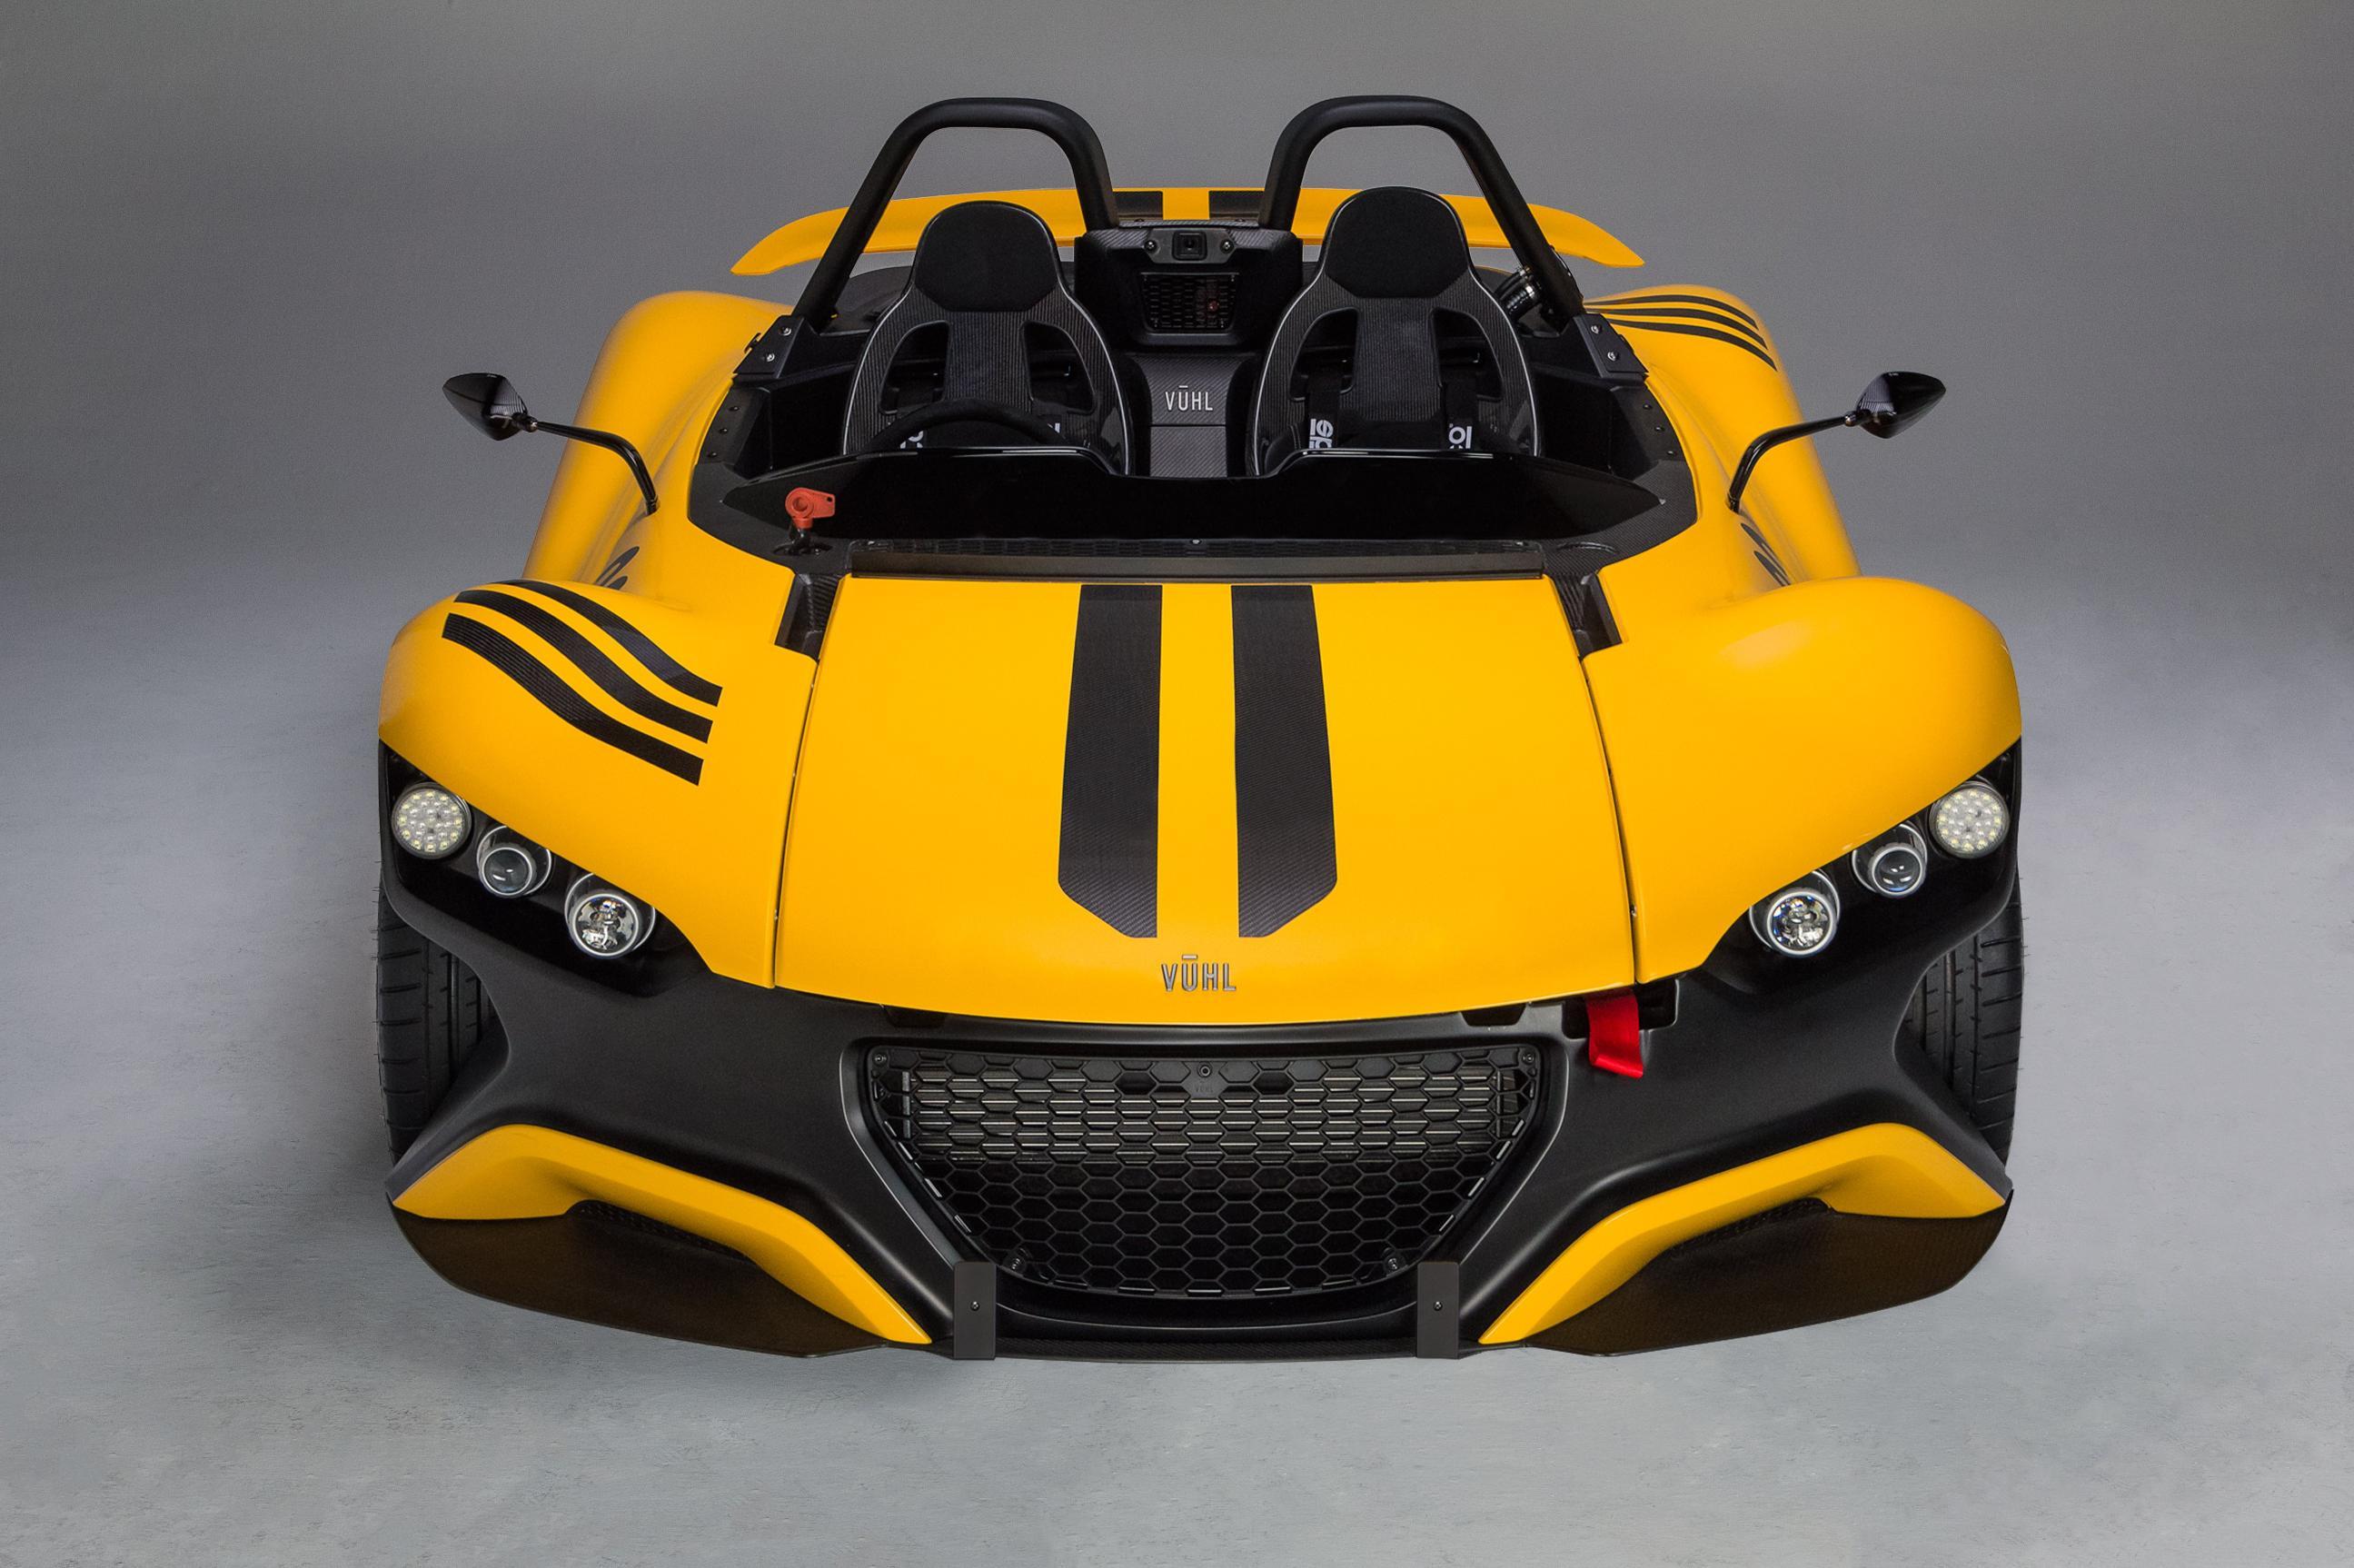 VUHL supercar